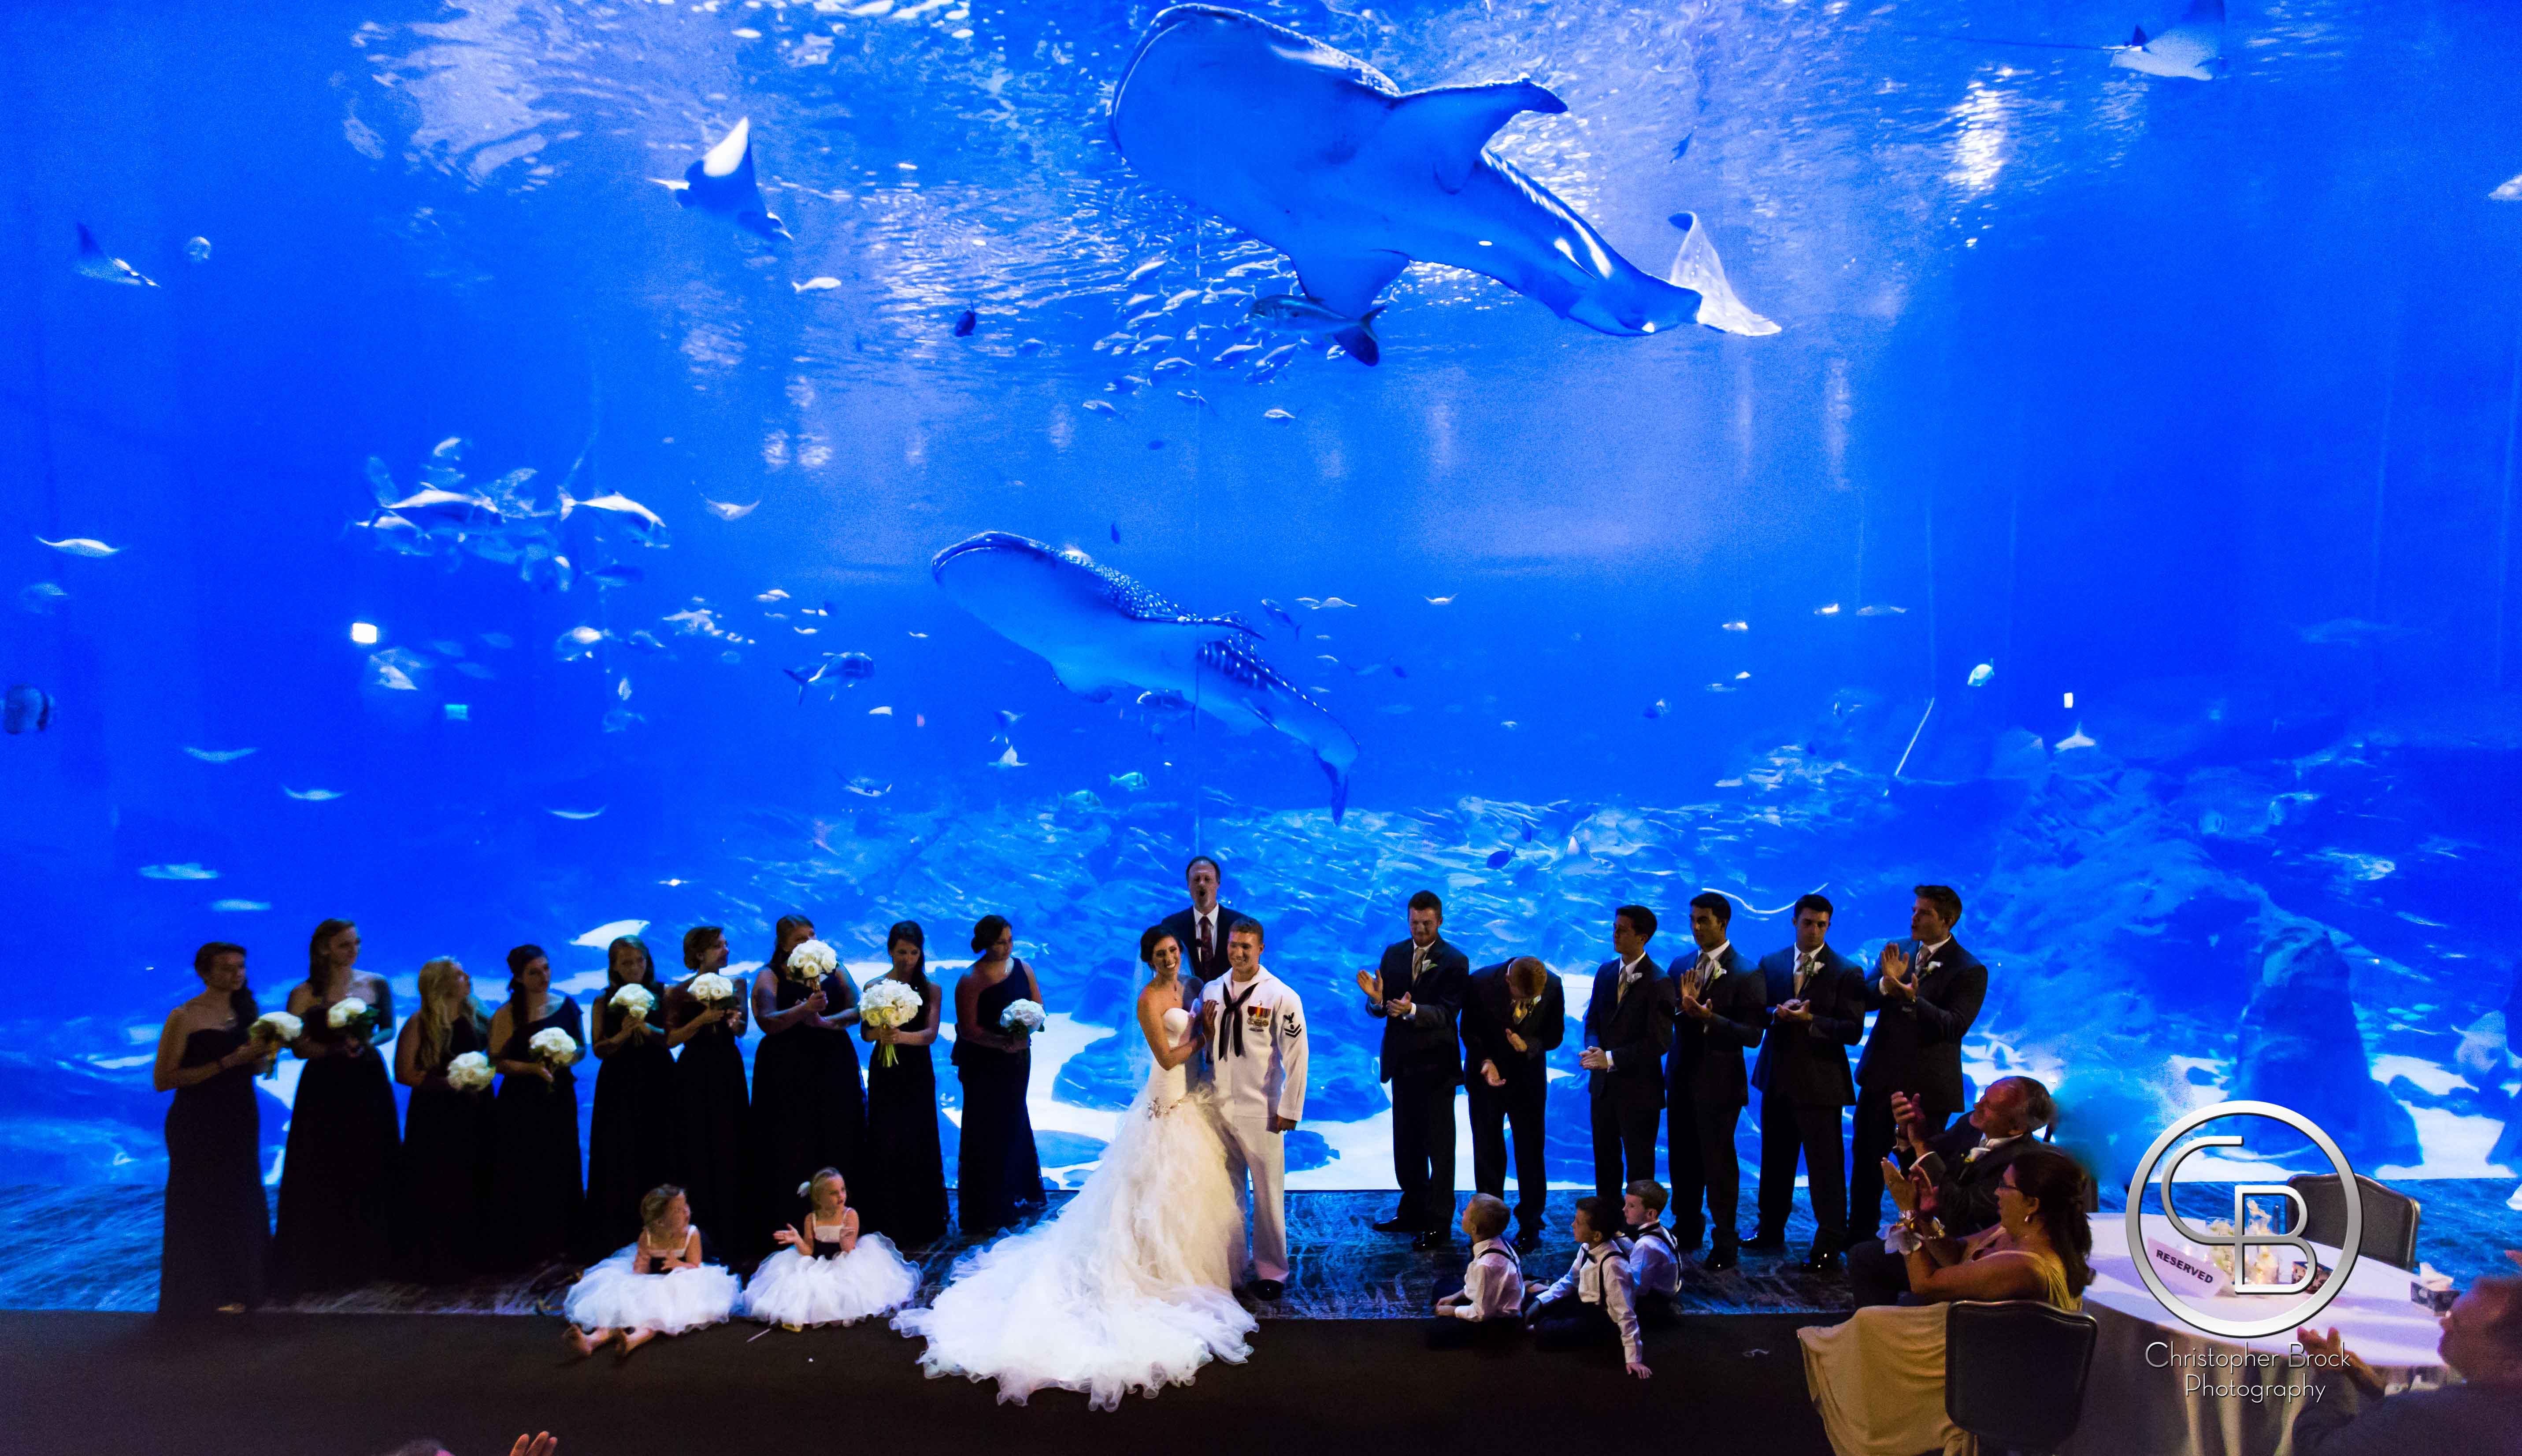 georgia aquarium wedding 2 - Christopher Brock Photography - Atlanta, GA